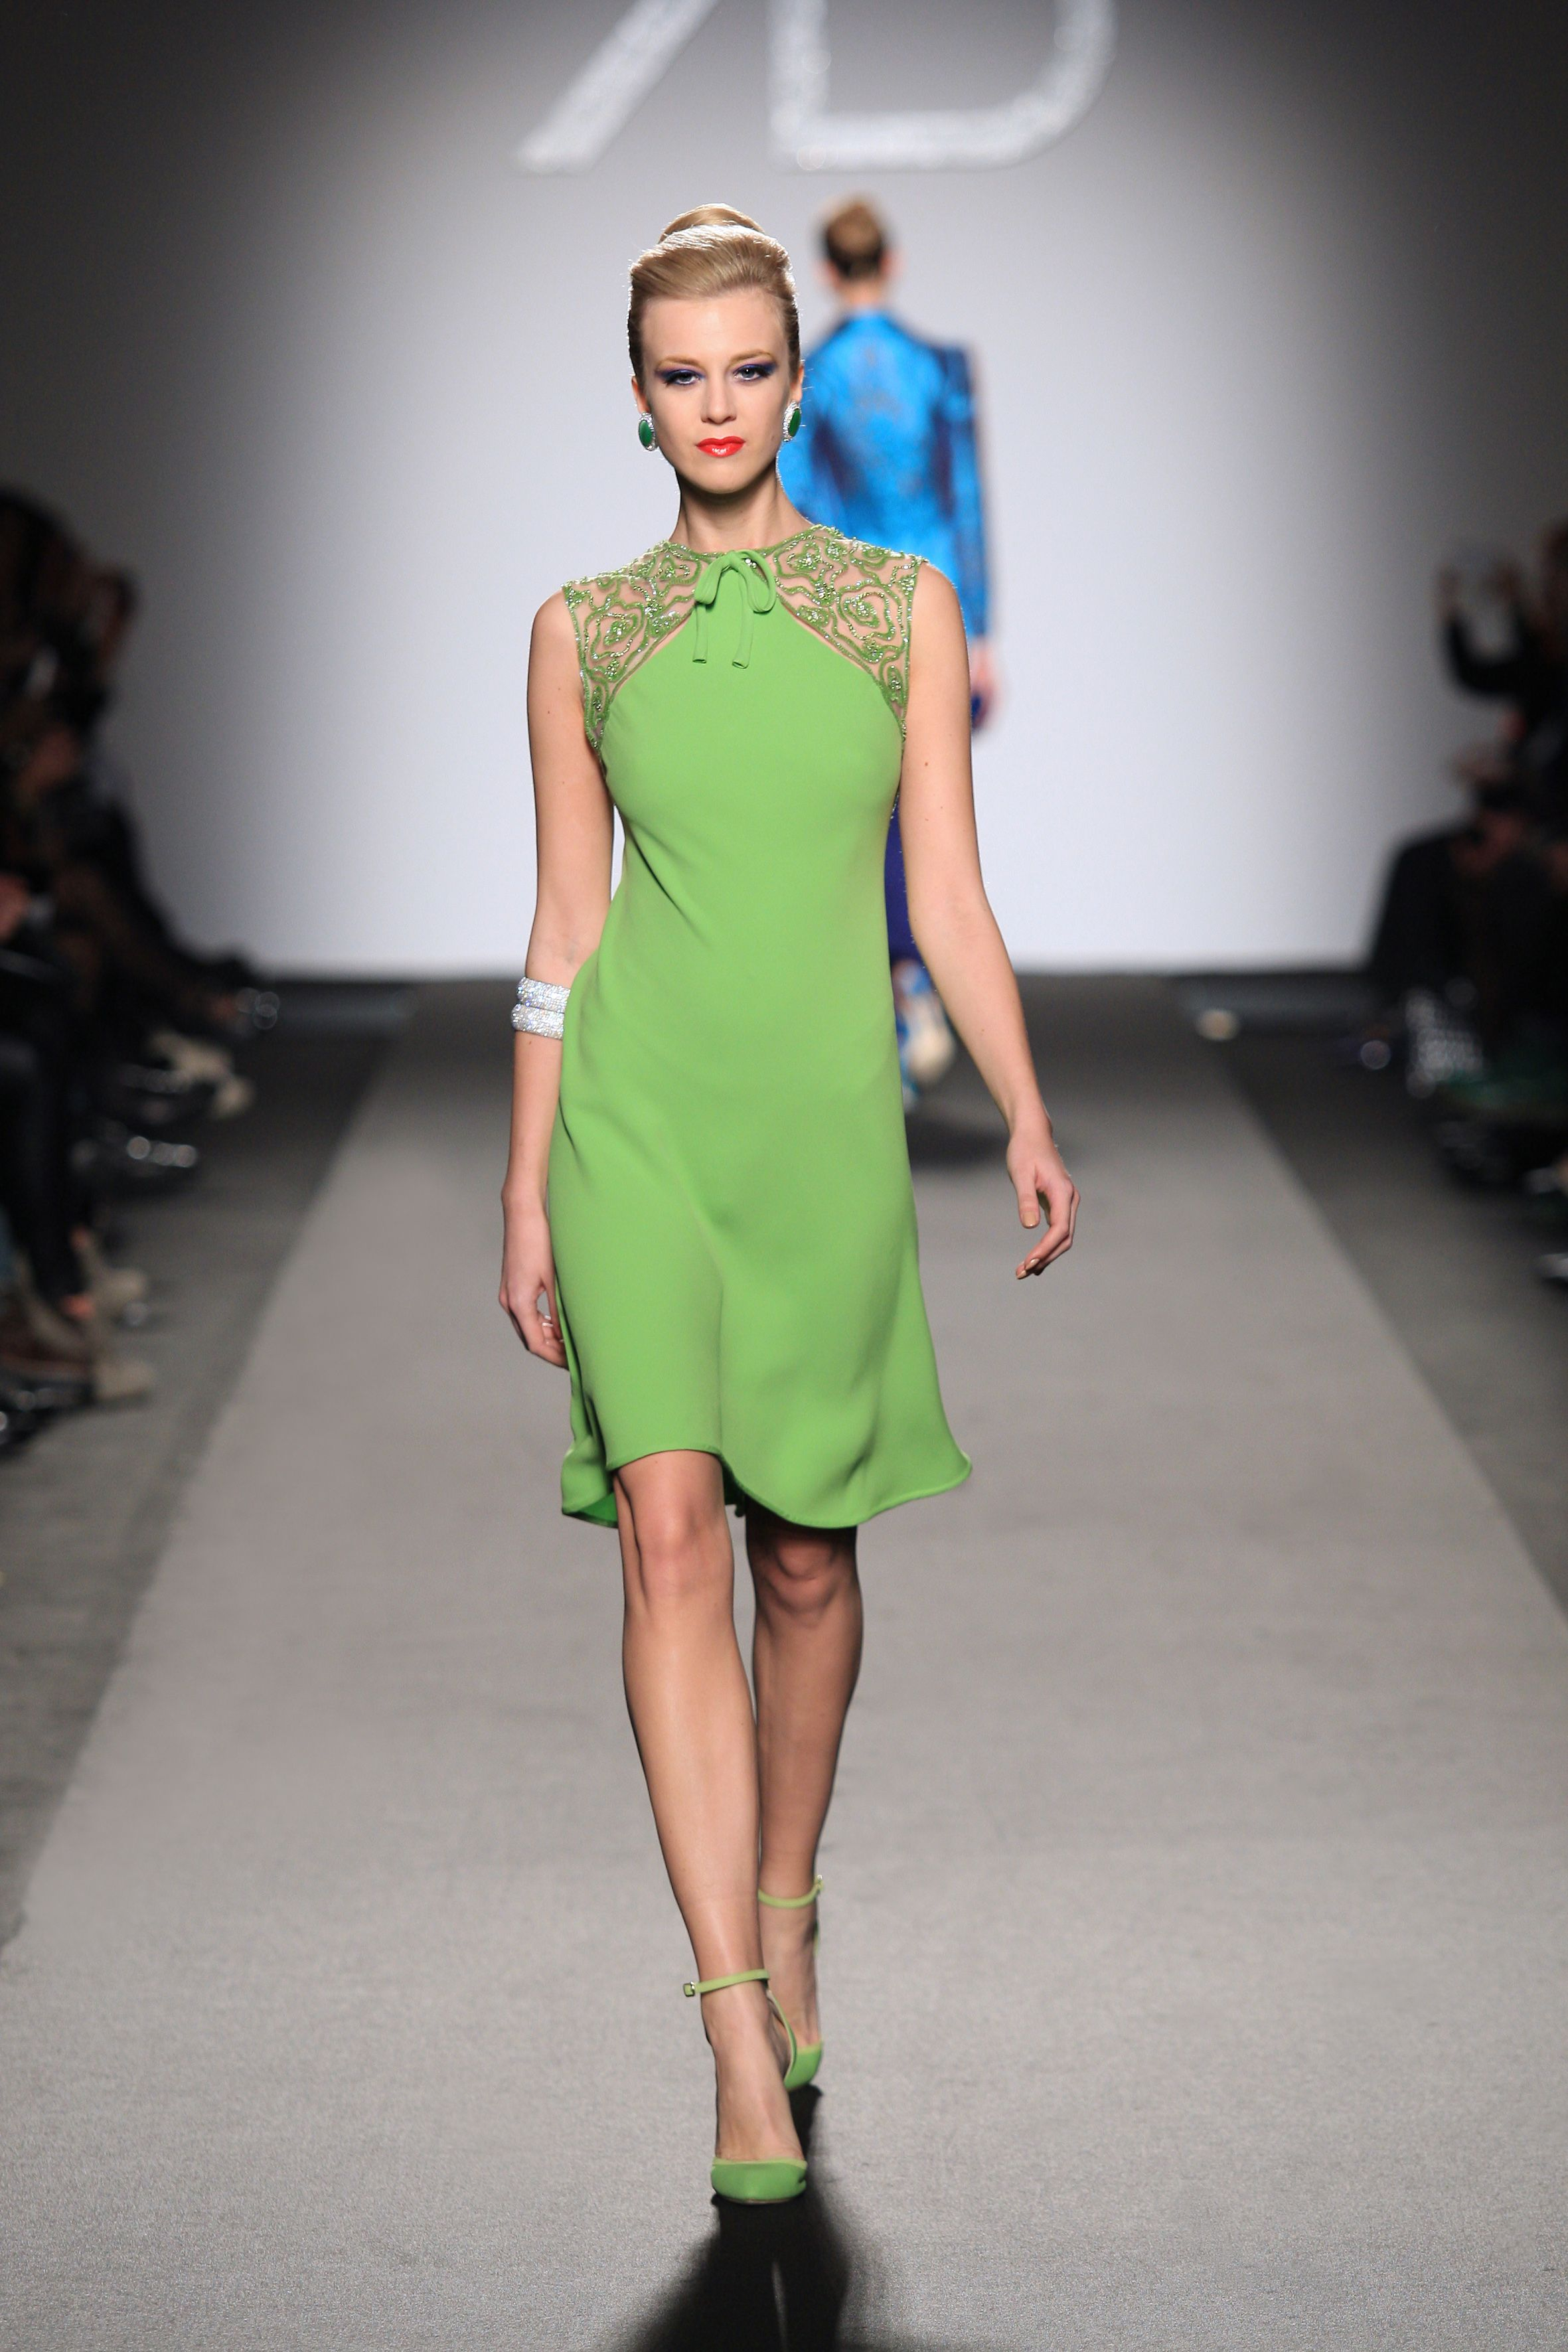 Renato Balestra HAUTE COUTURE SpringSummer 2014 Renato Balestra High Fashion Haute Couture featured fashion